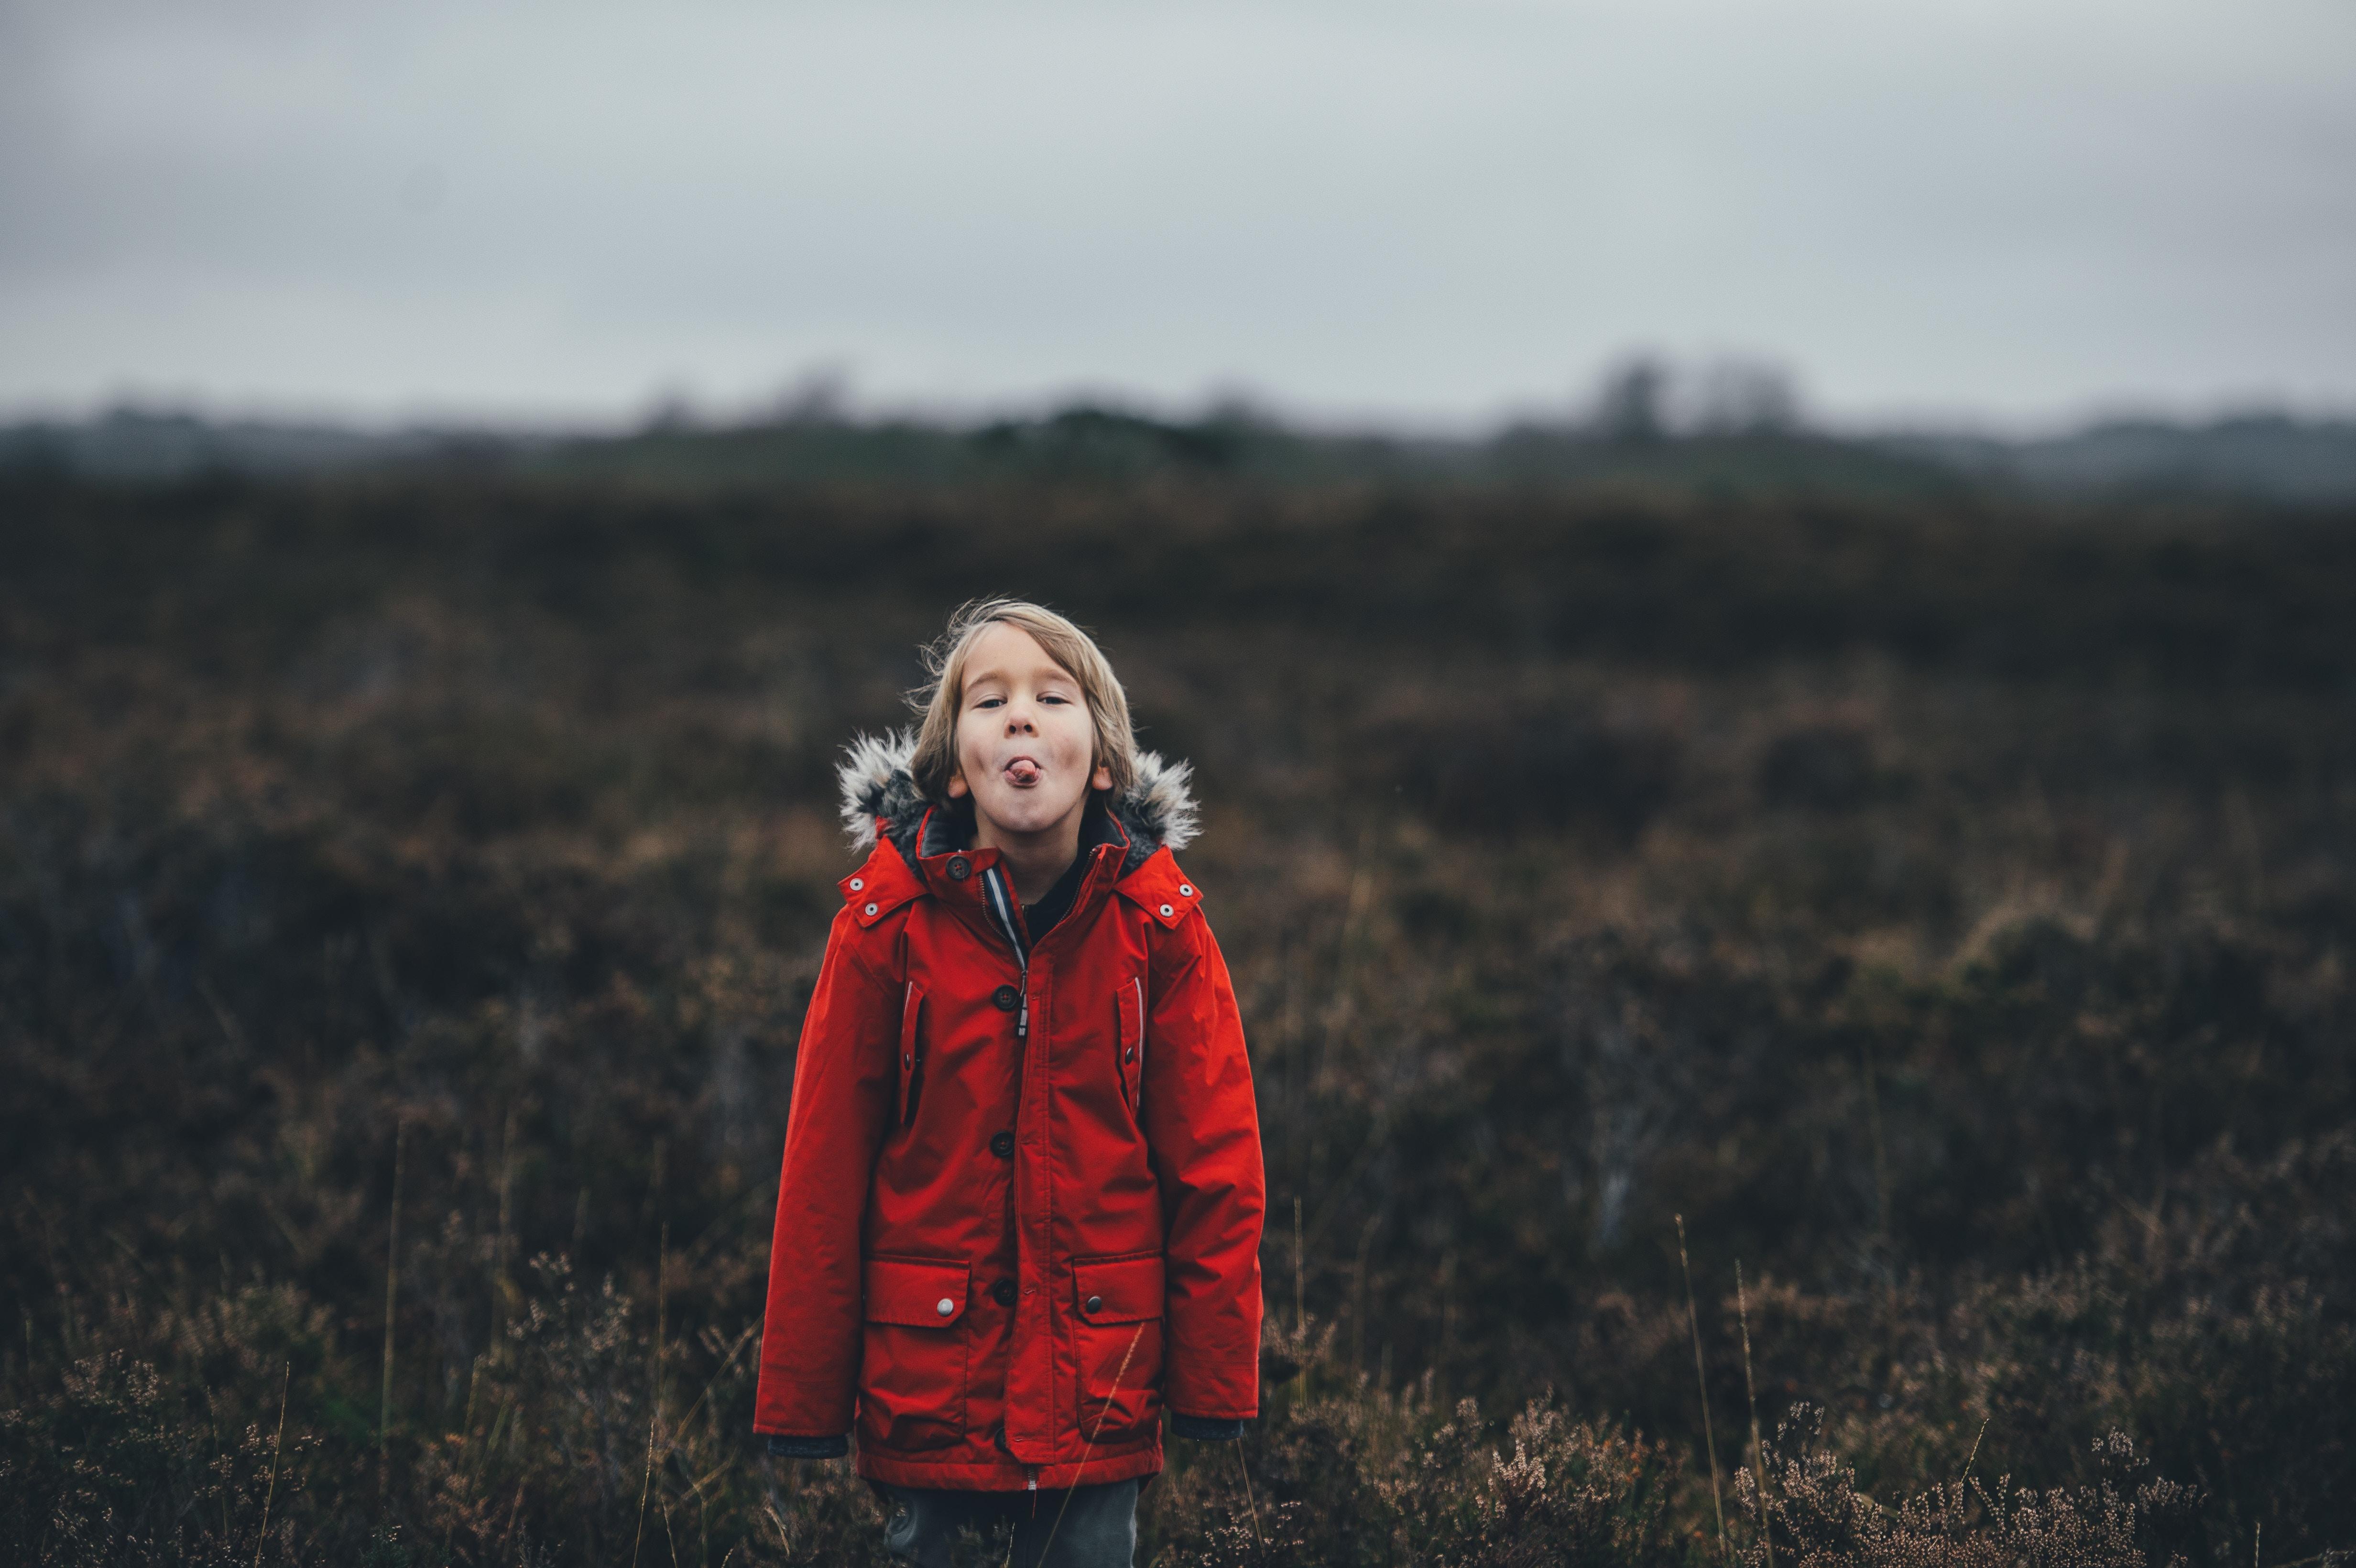 Balanced Lifestyle Habits for Child Actors